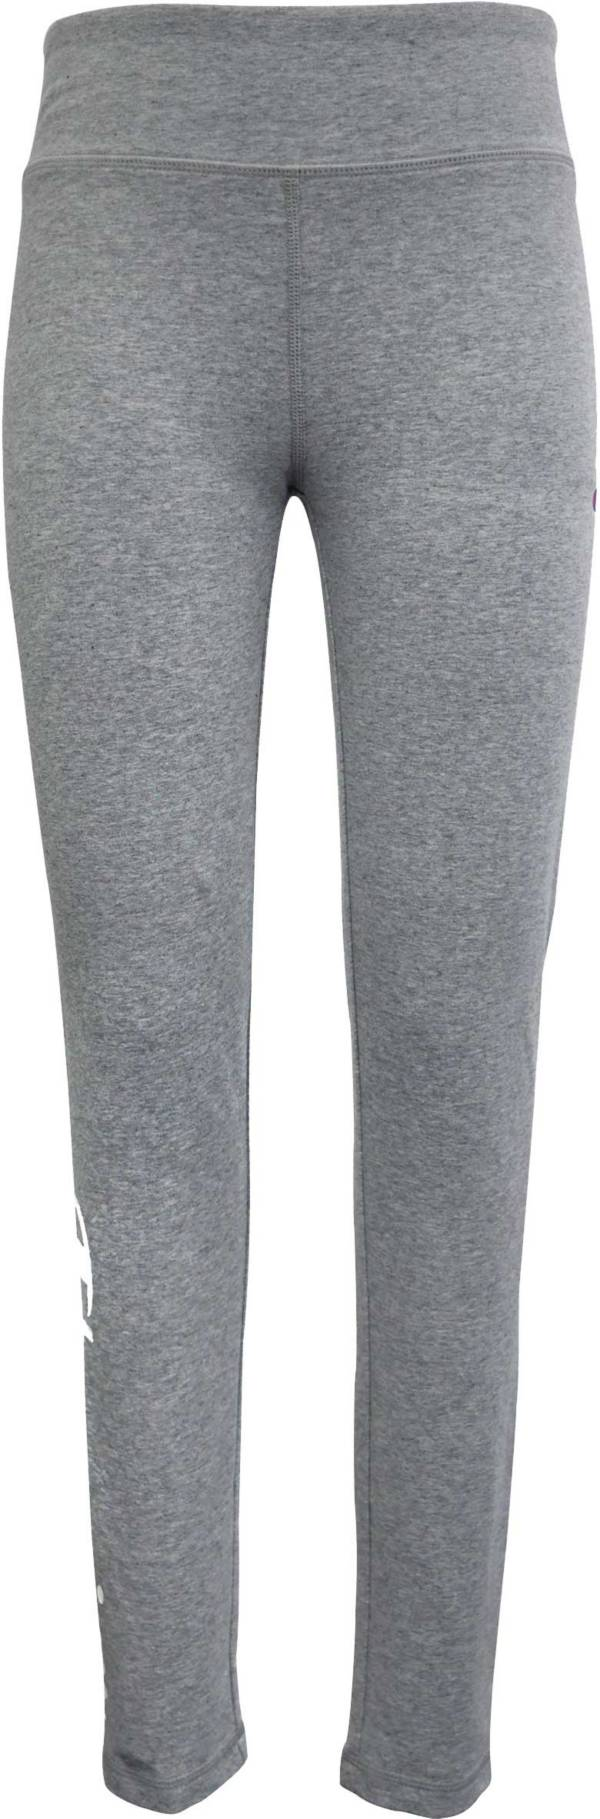 Champion Girls' Script Leggings product image